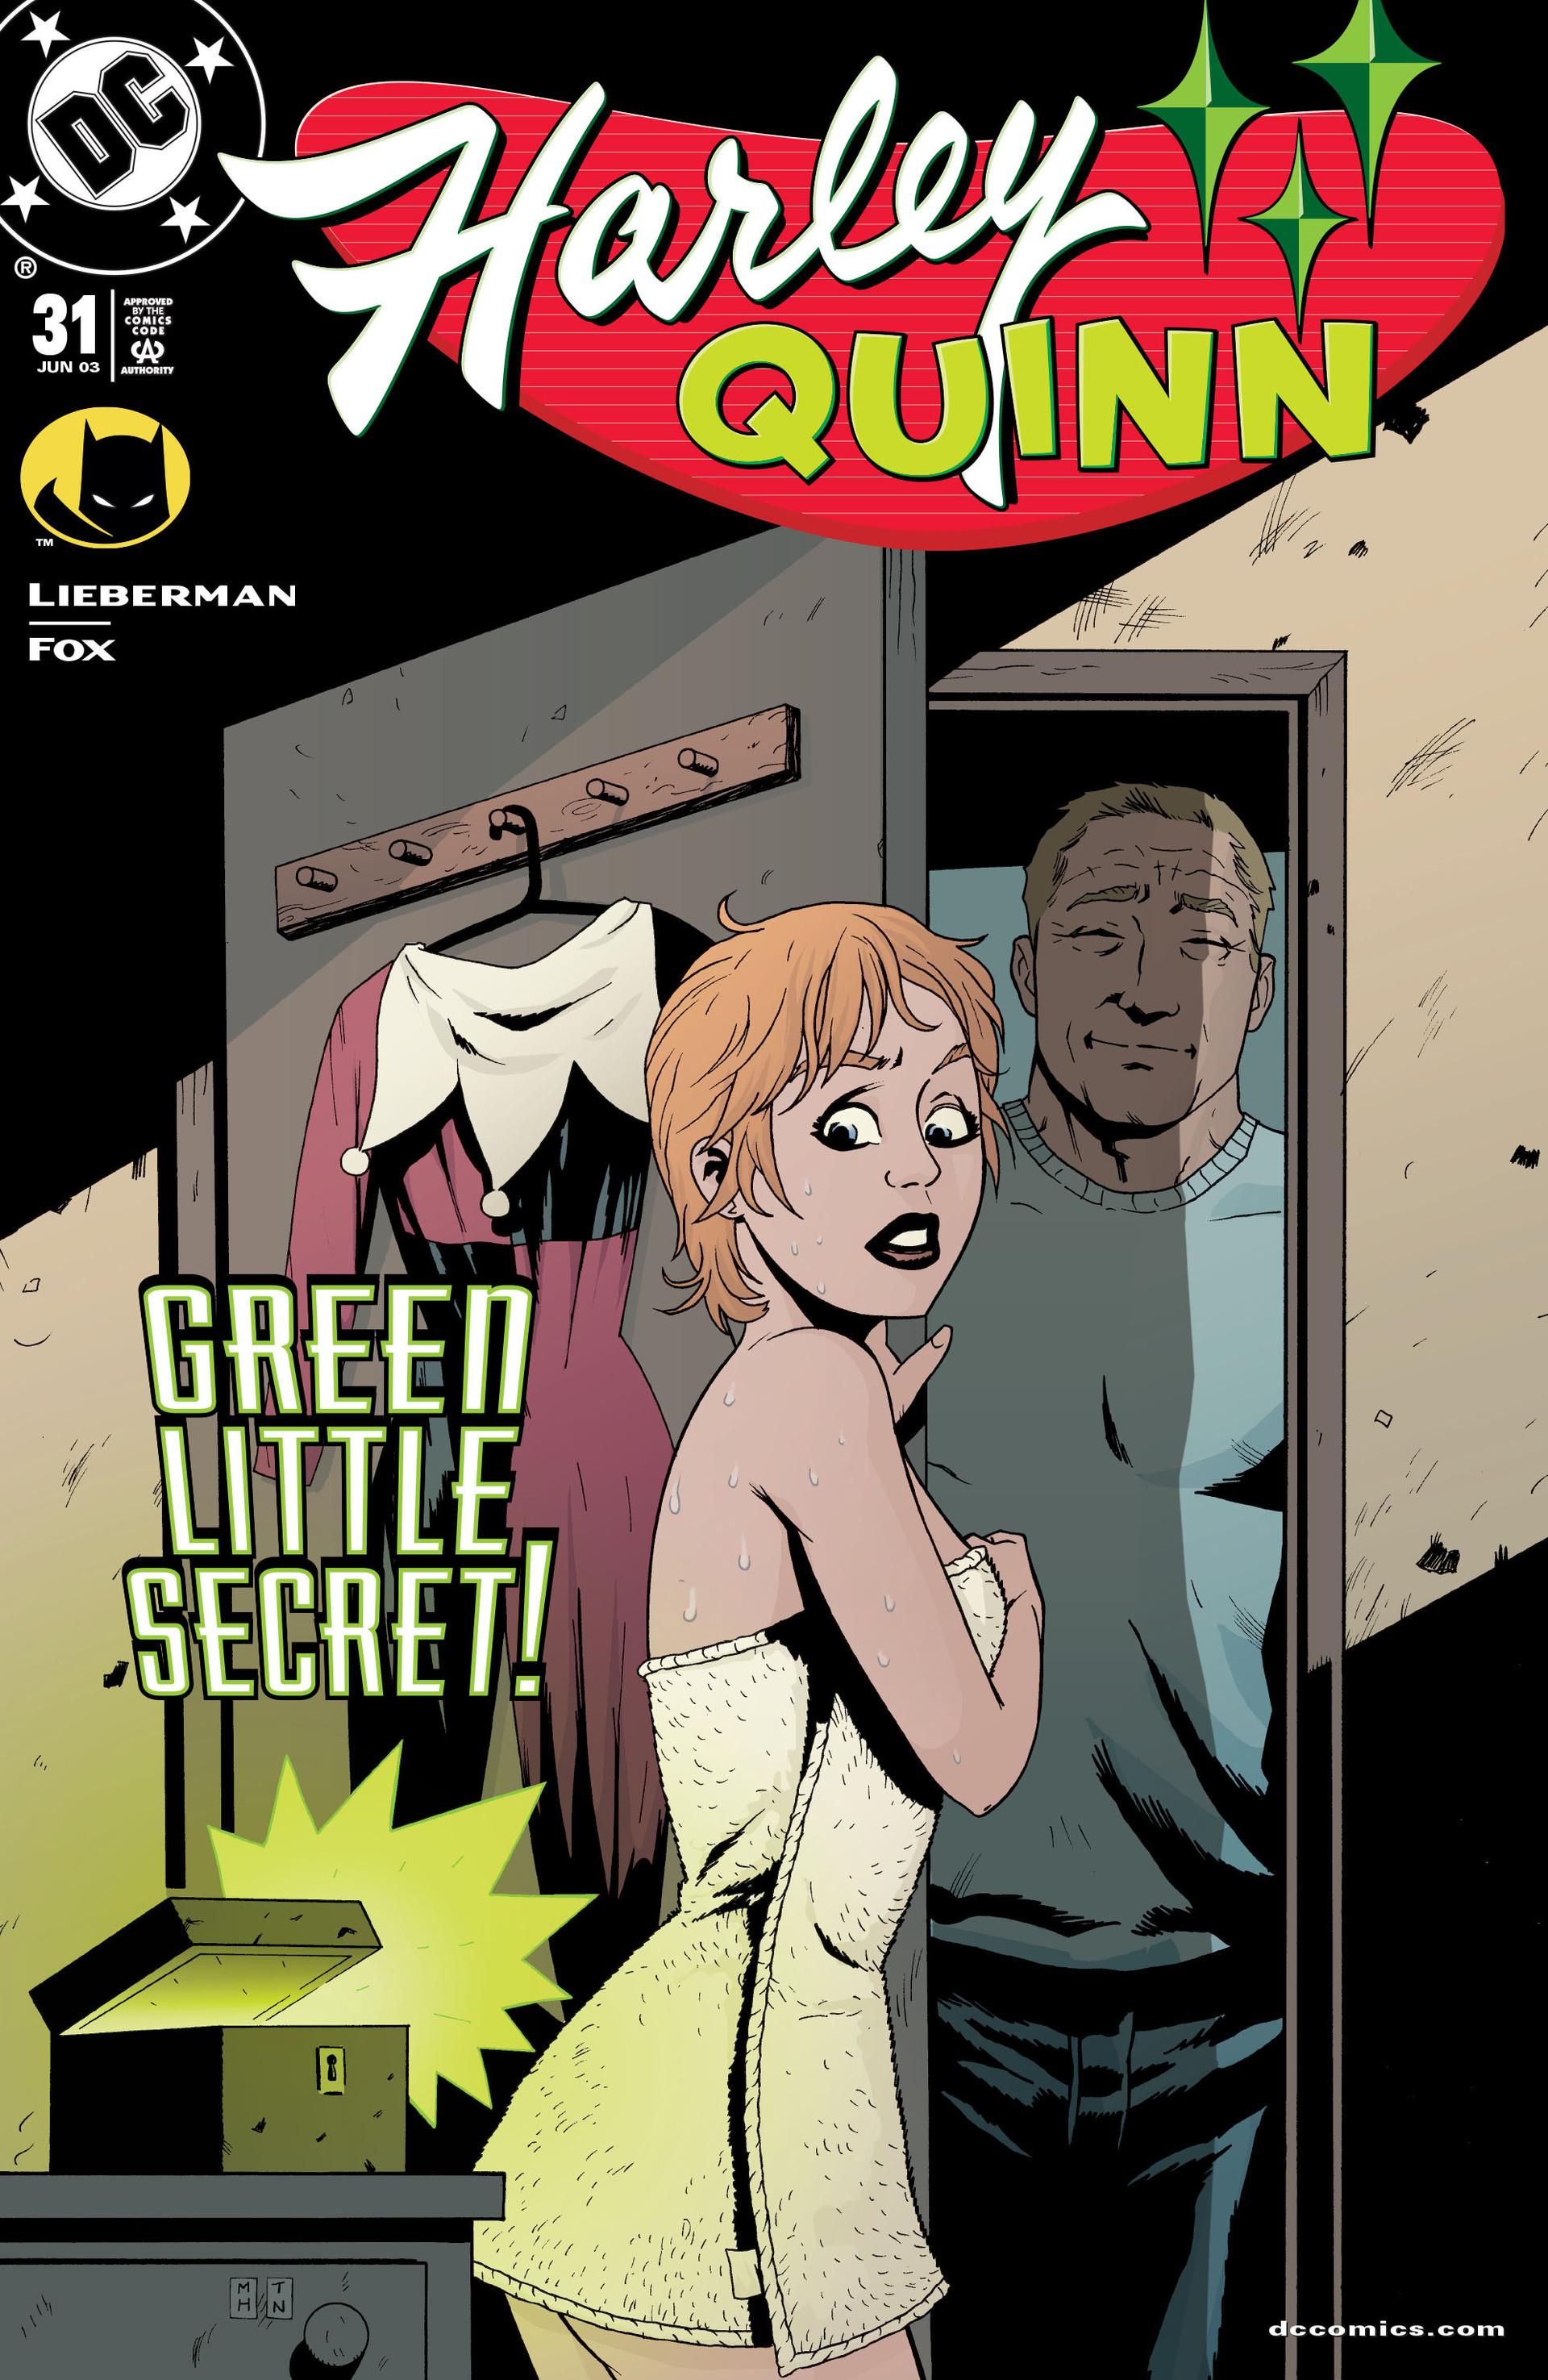 Harley Quinn Vol.1 #31